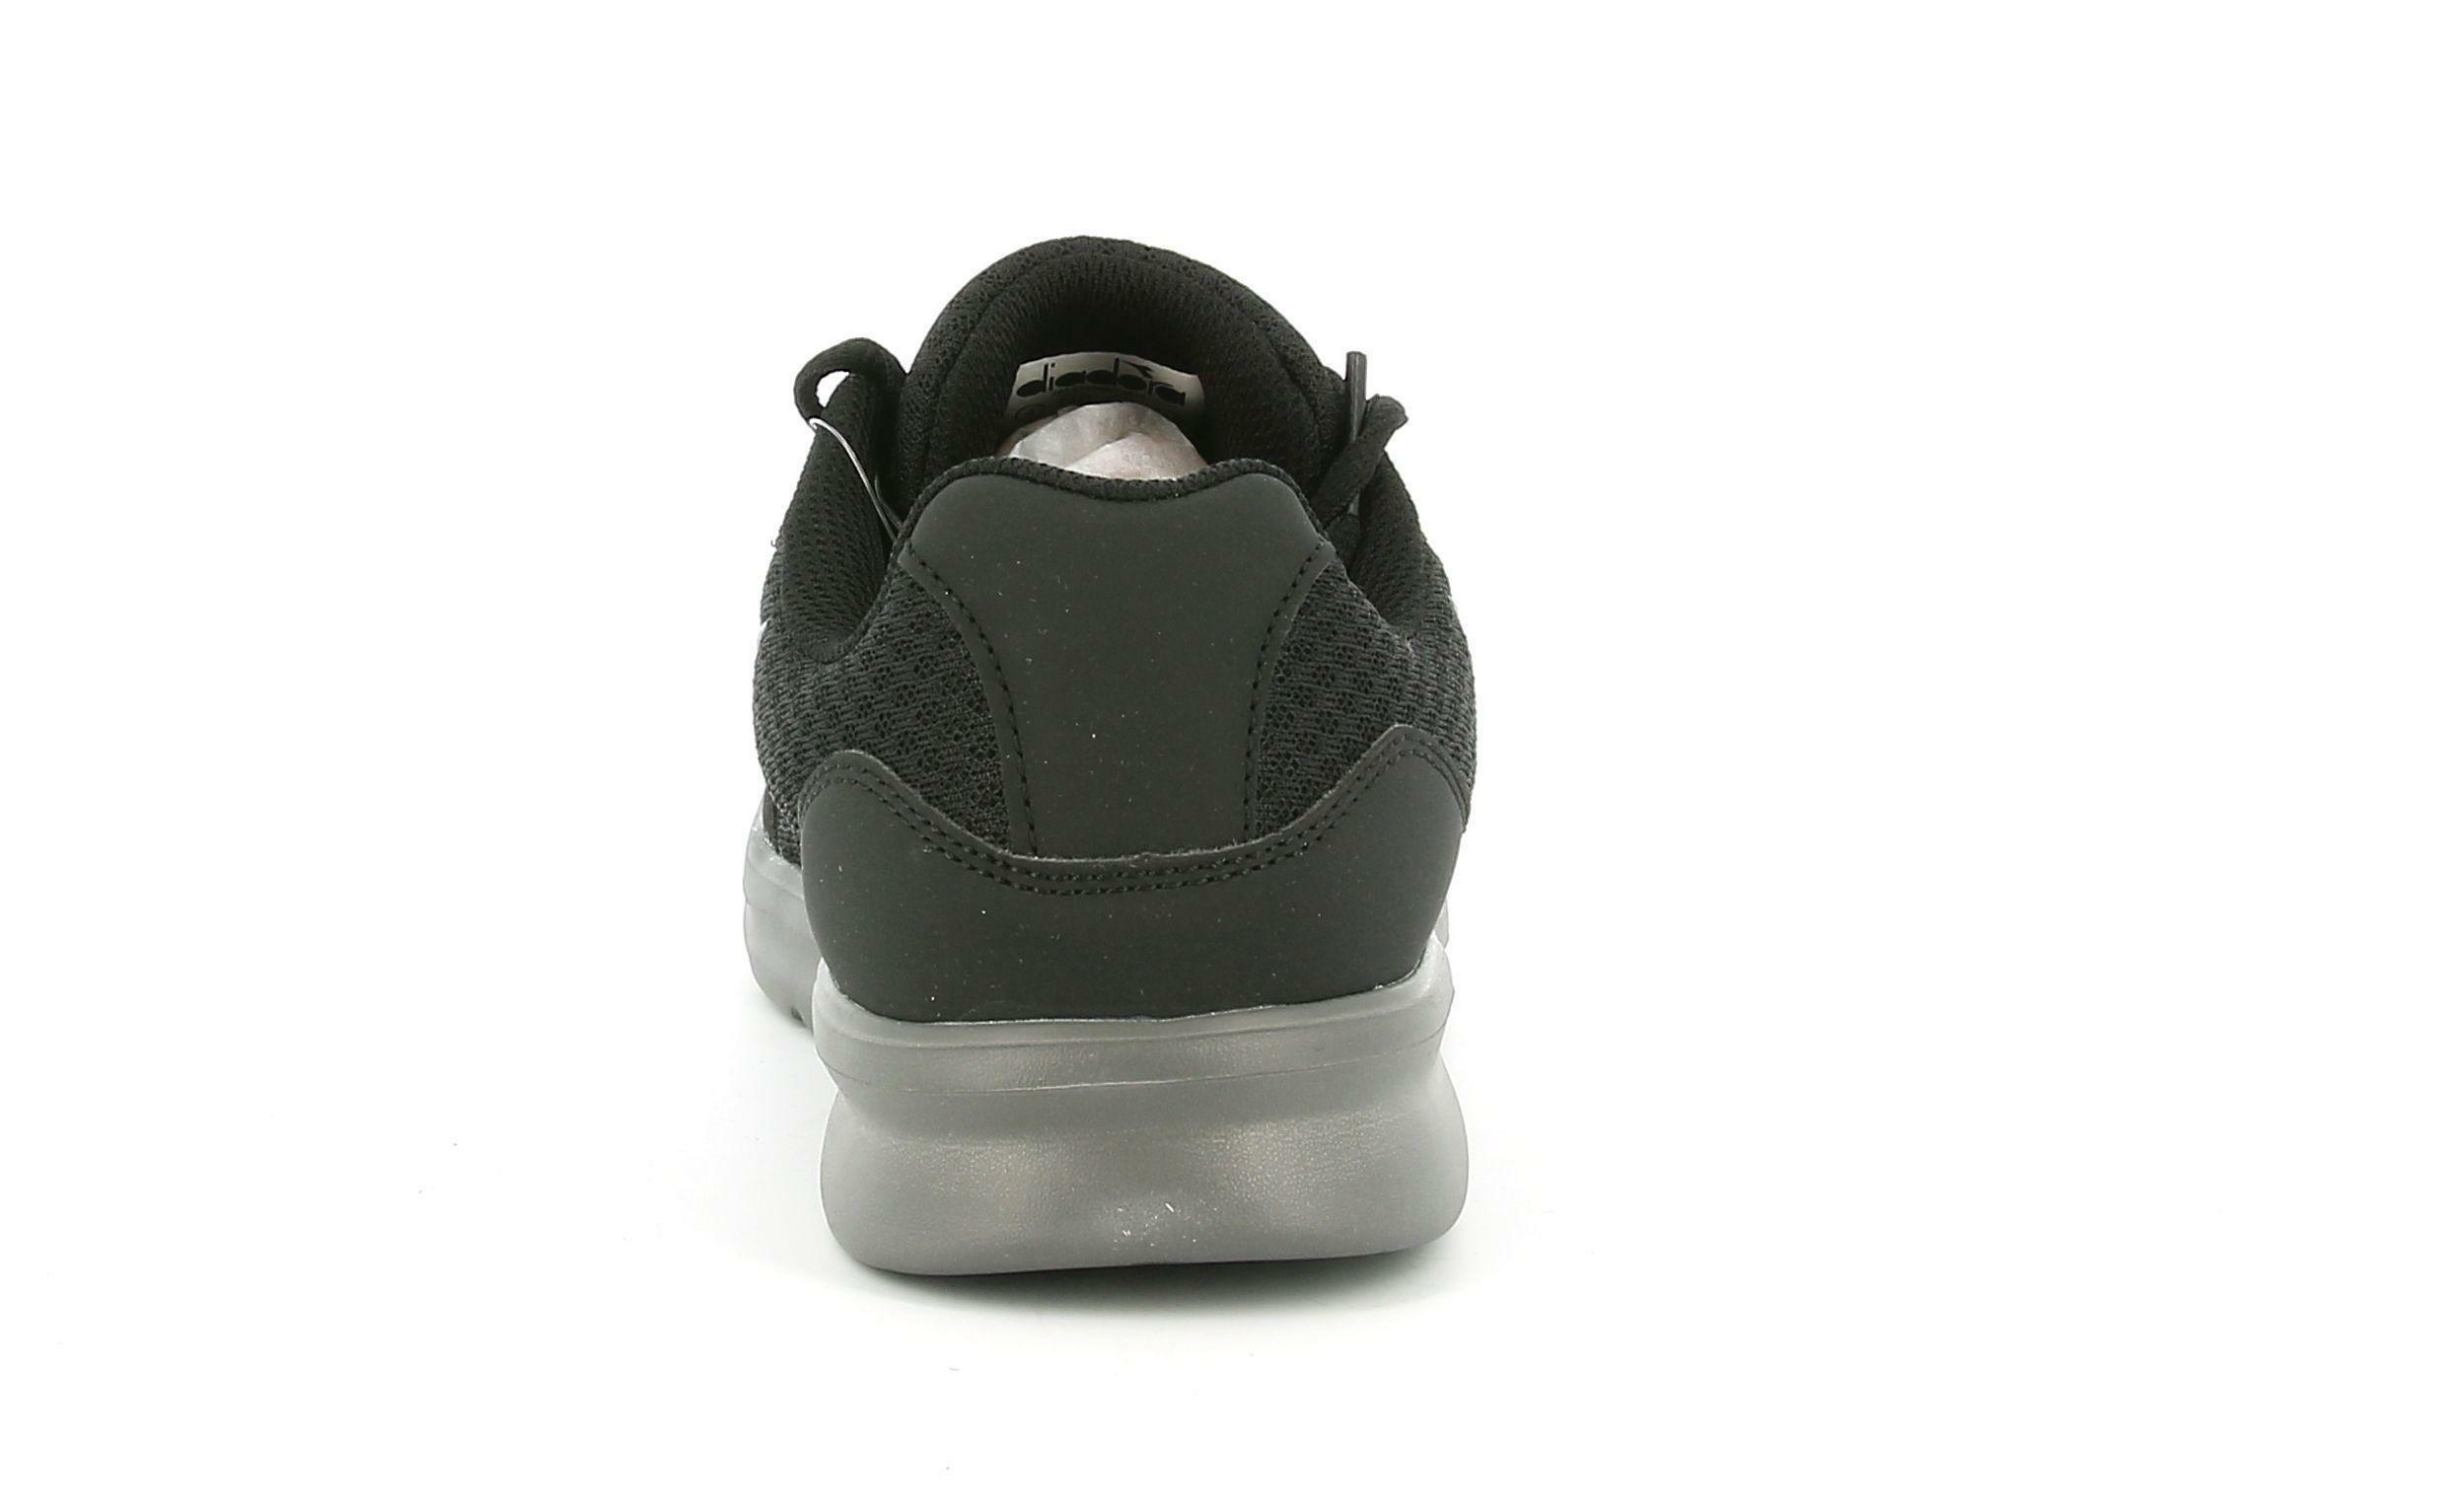 diadora diadora - scarpa da running robin per uomo nero/grigio acciaio 175949 nero